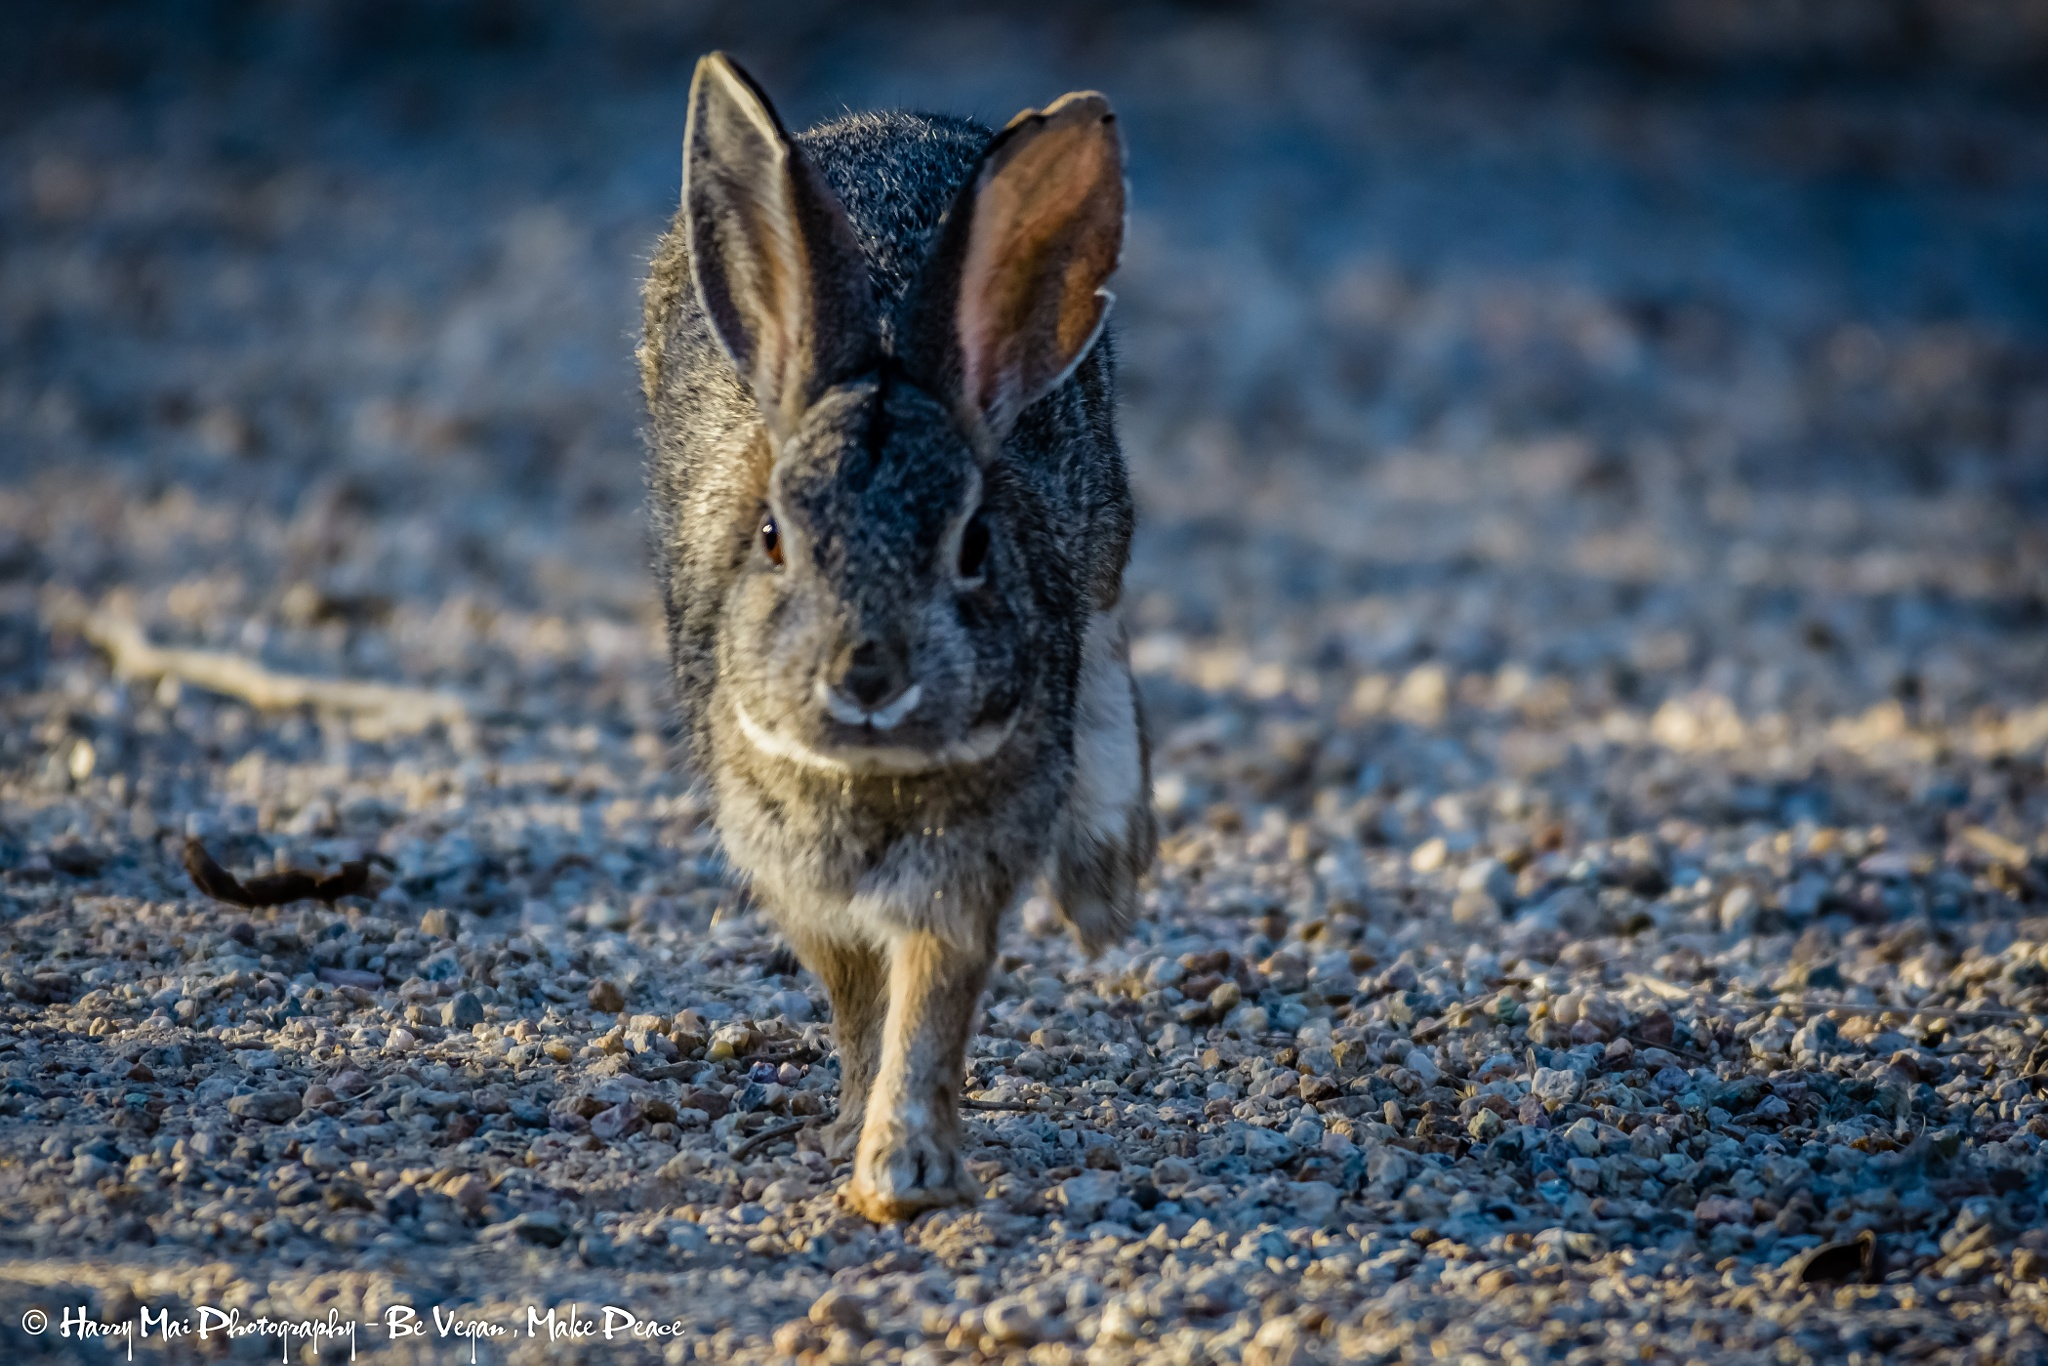 Mr. Rabbit by Harry Mai